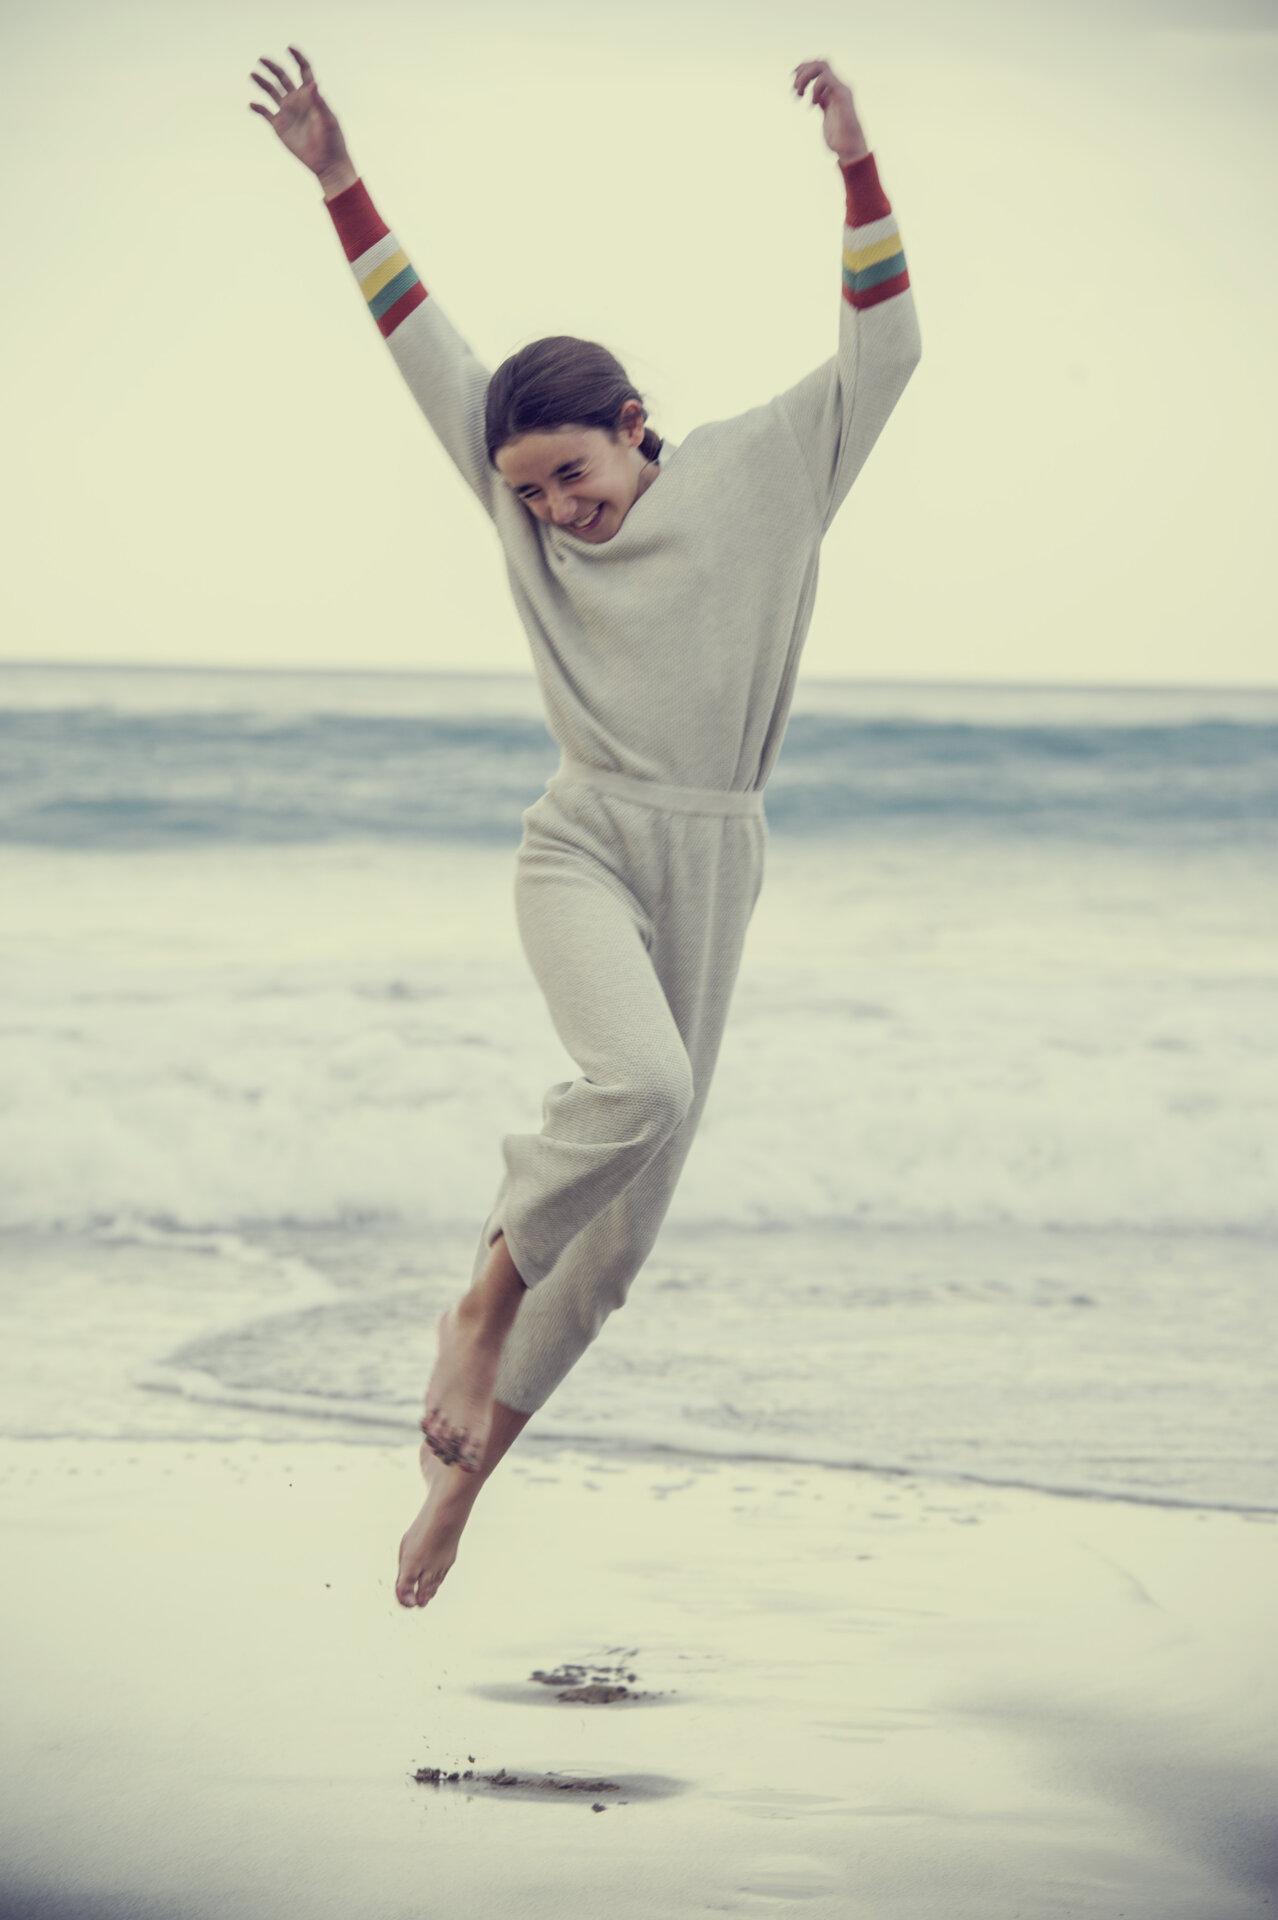 HONDARRIBI jumper